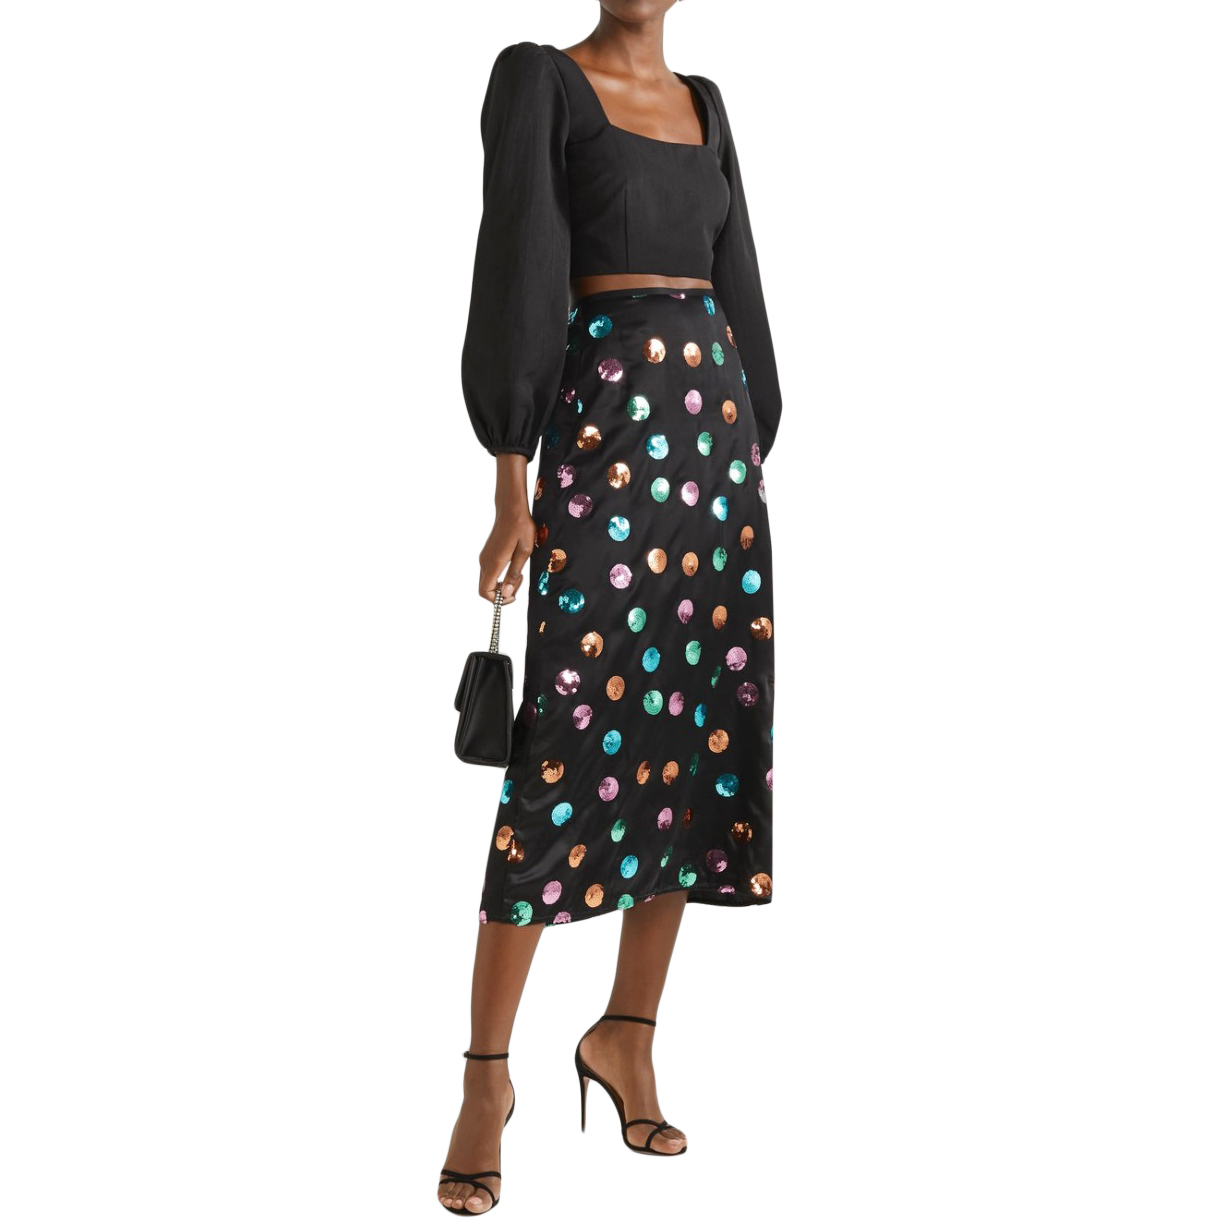 Rixo Kelly Embellished Skirt - New Season